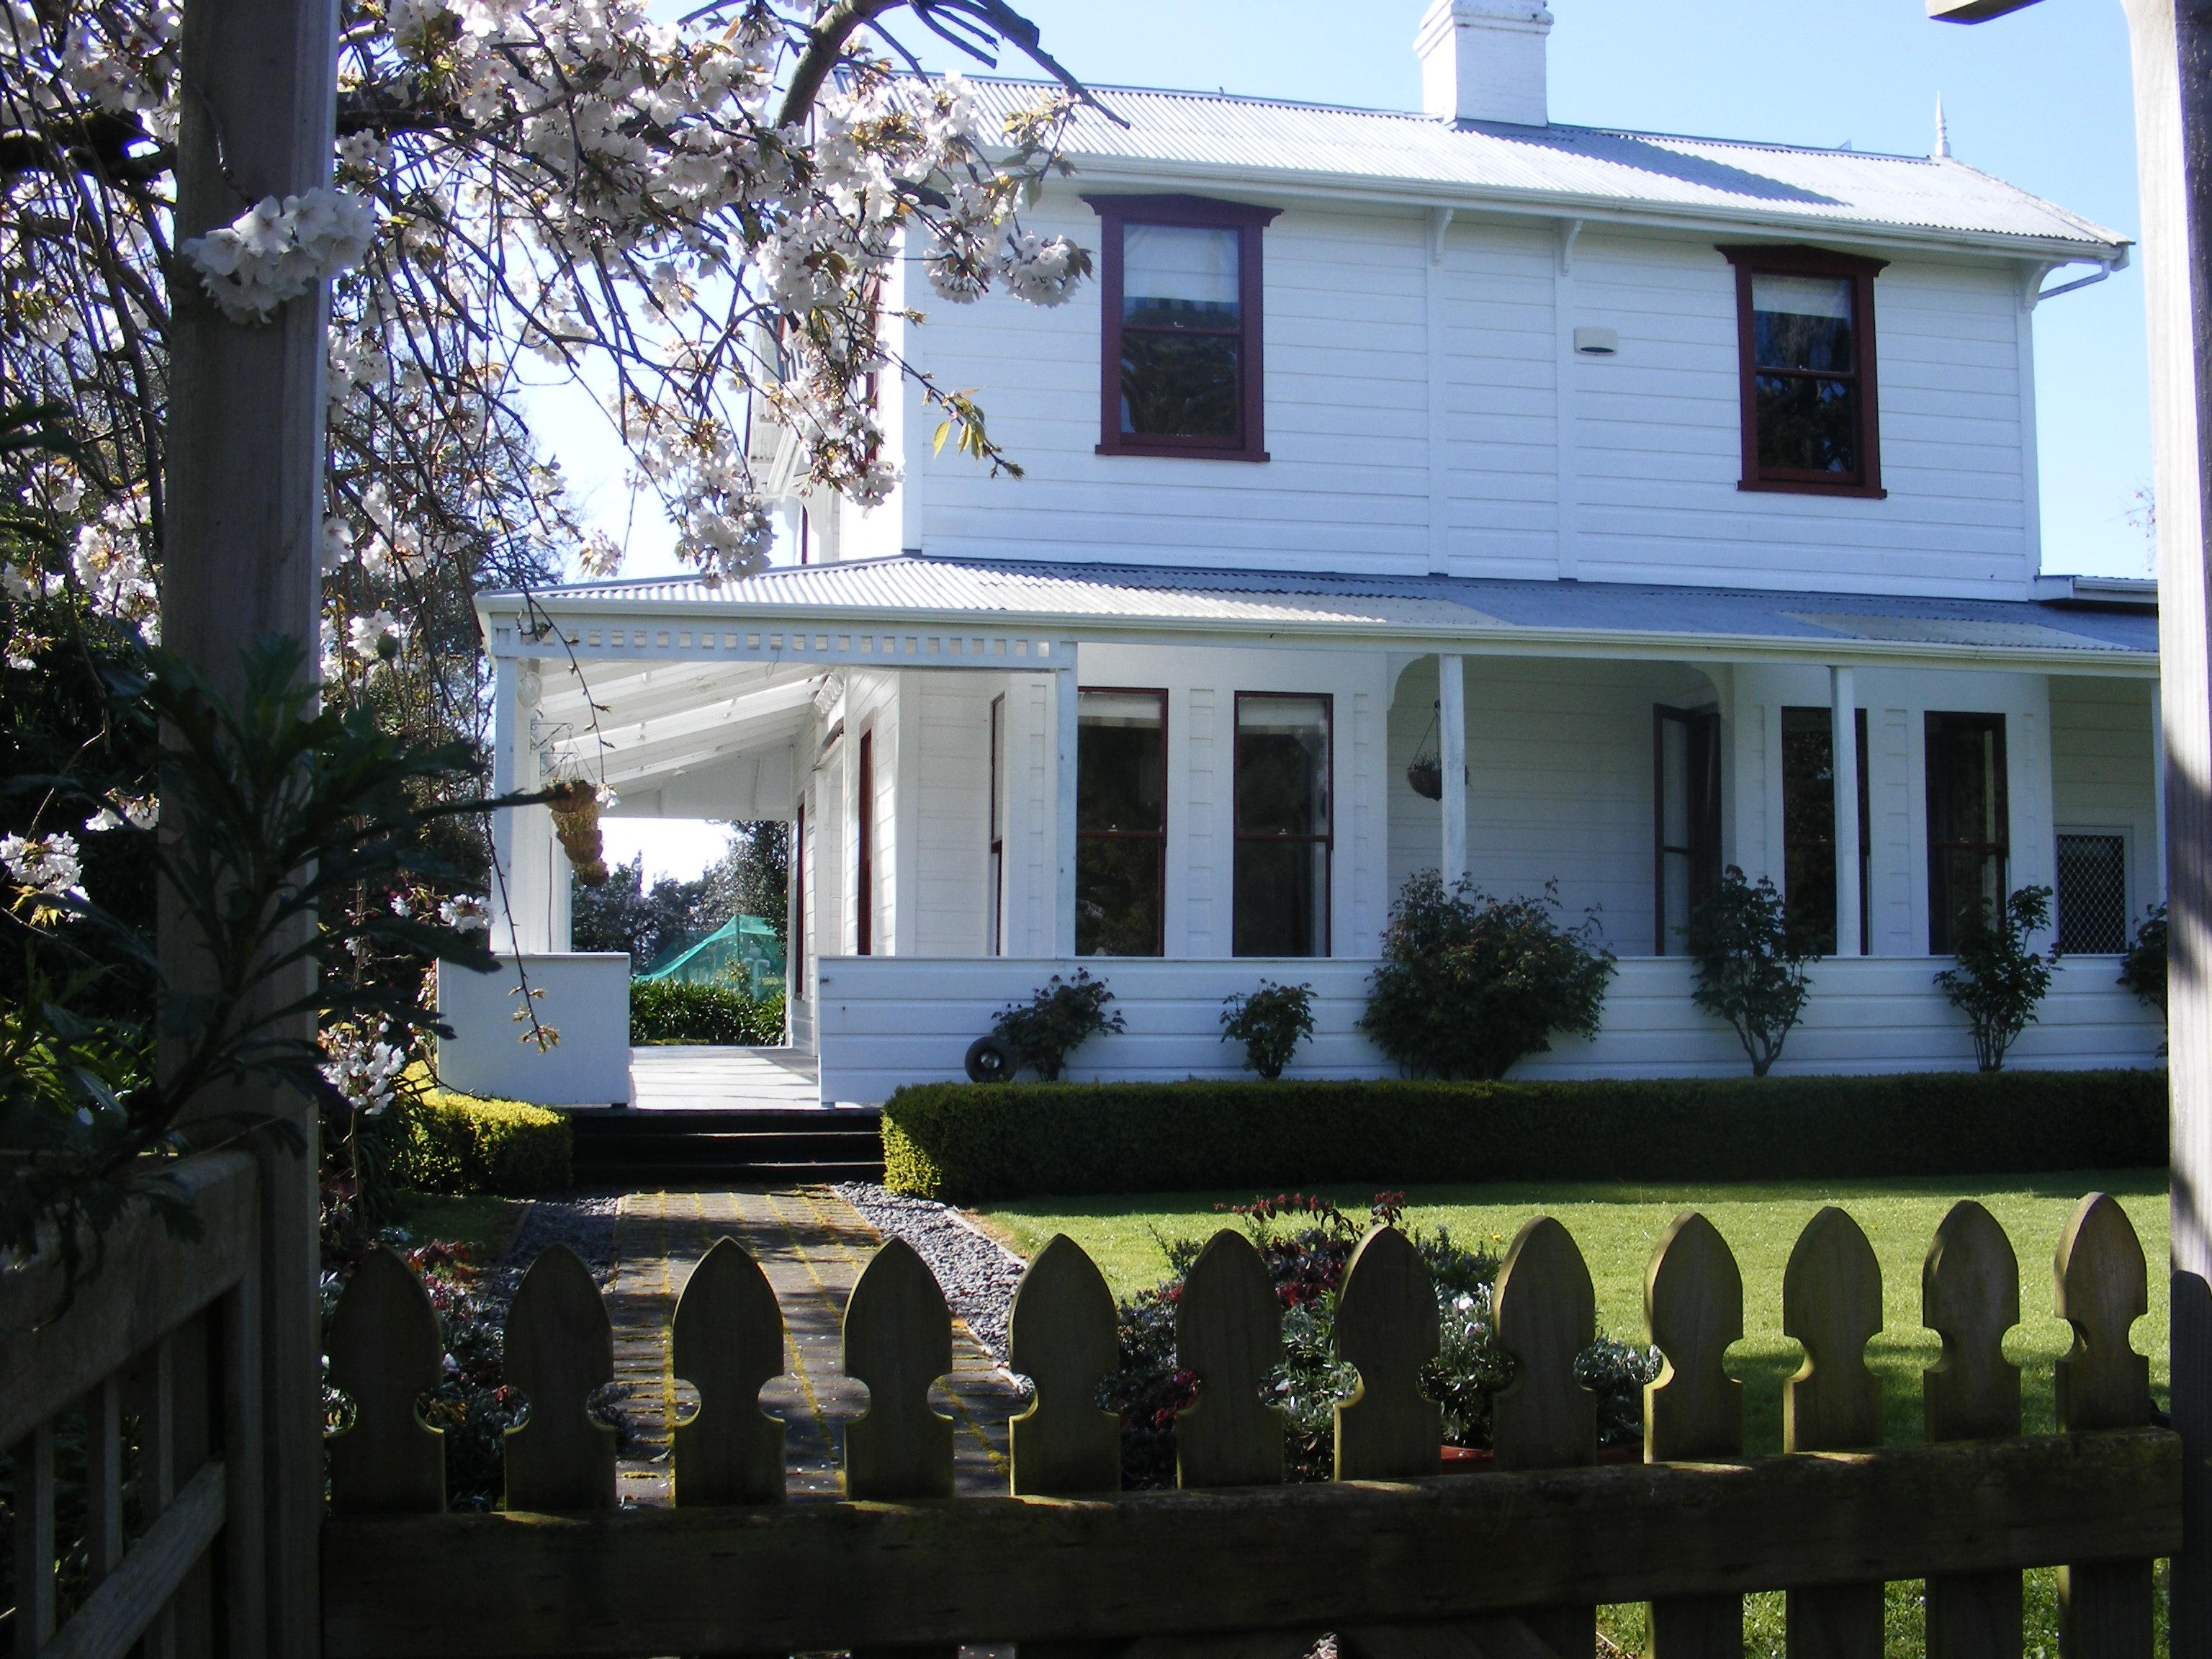 Fordell Homestead: Western elevation